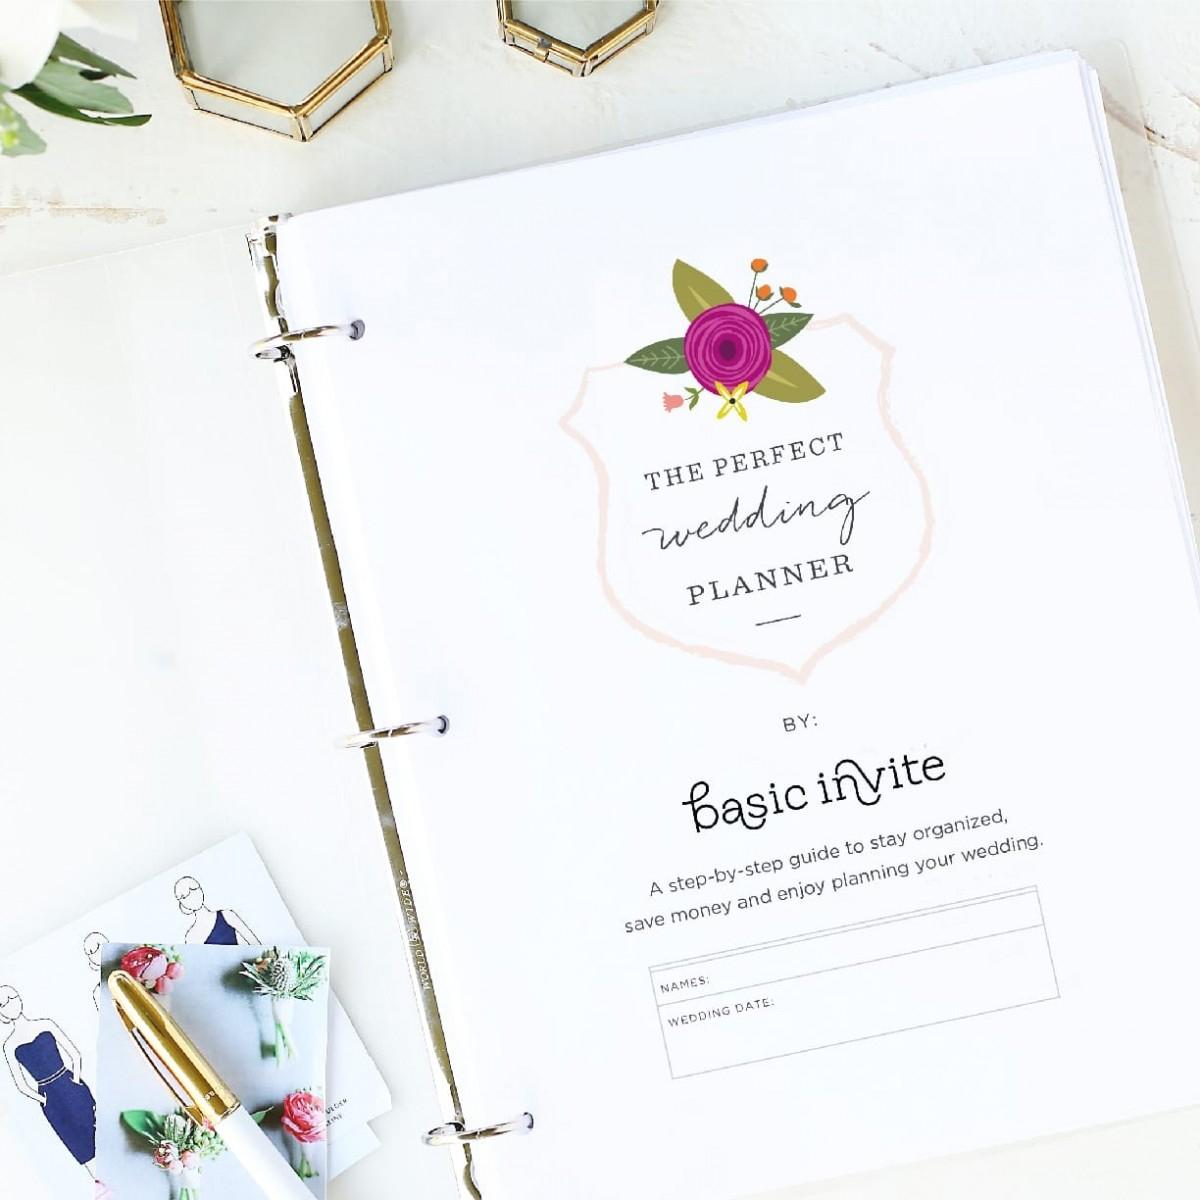 Wedding Planner Printablebasic Invite - Free Printable Wedding Planner Workbook